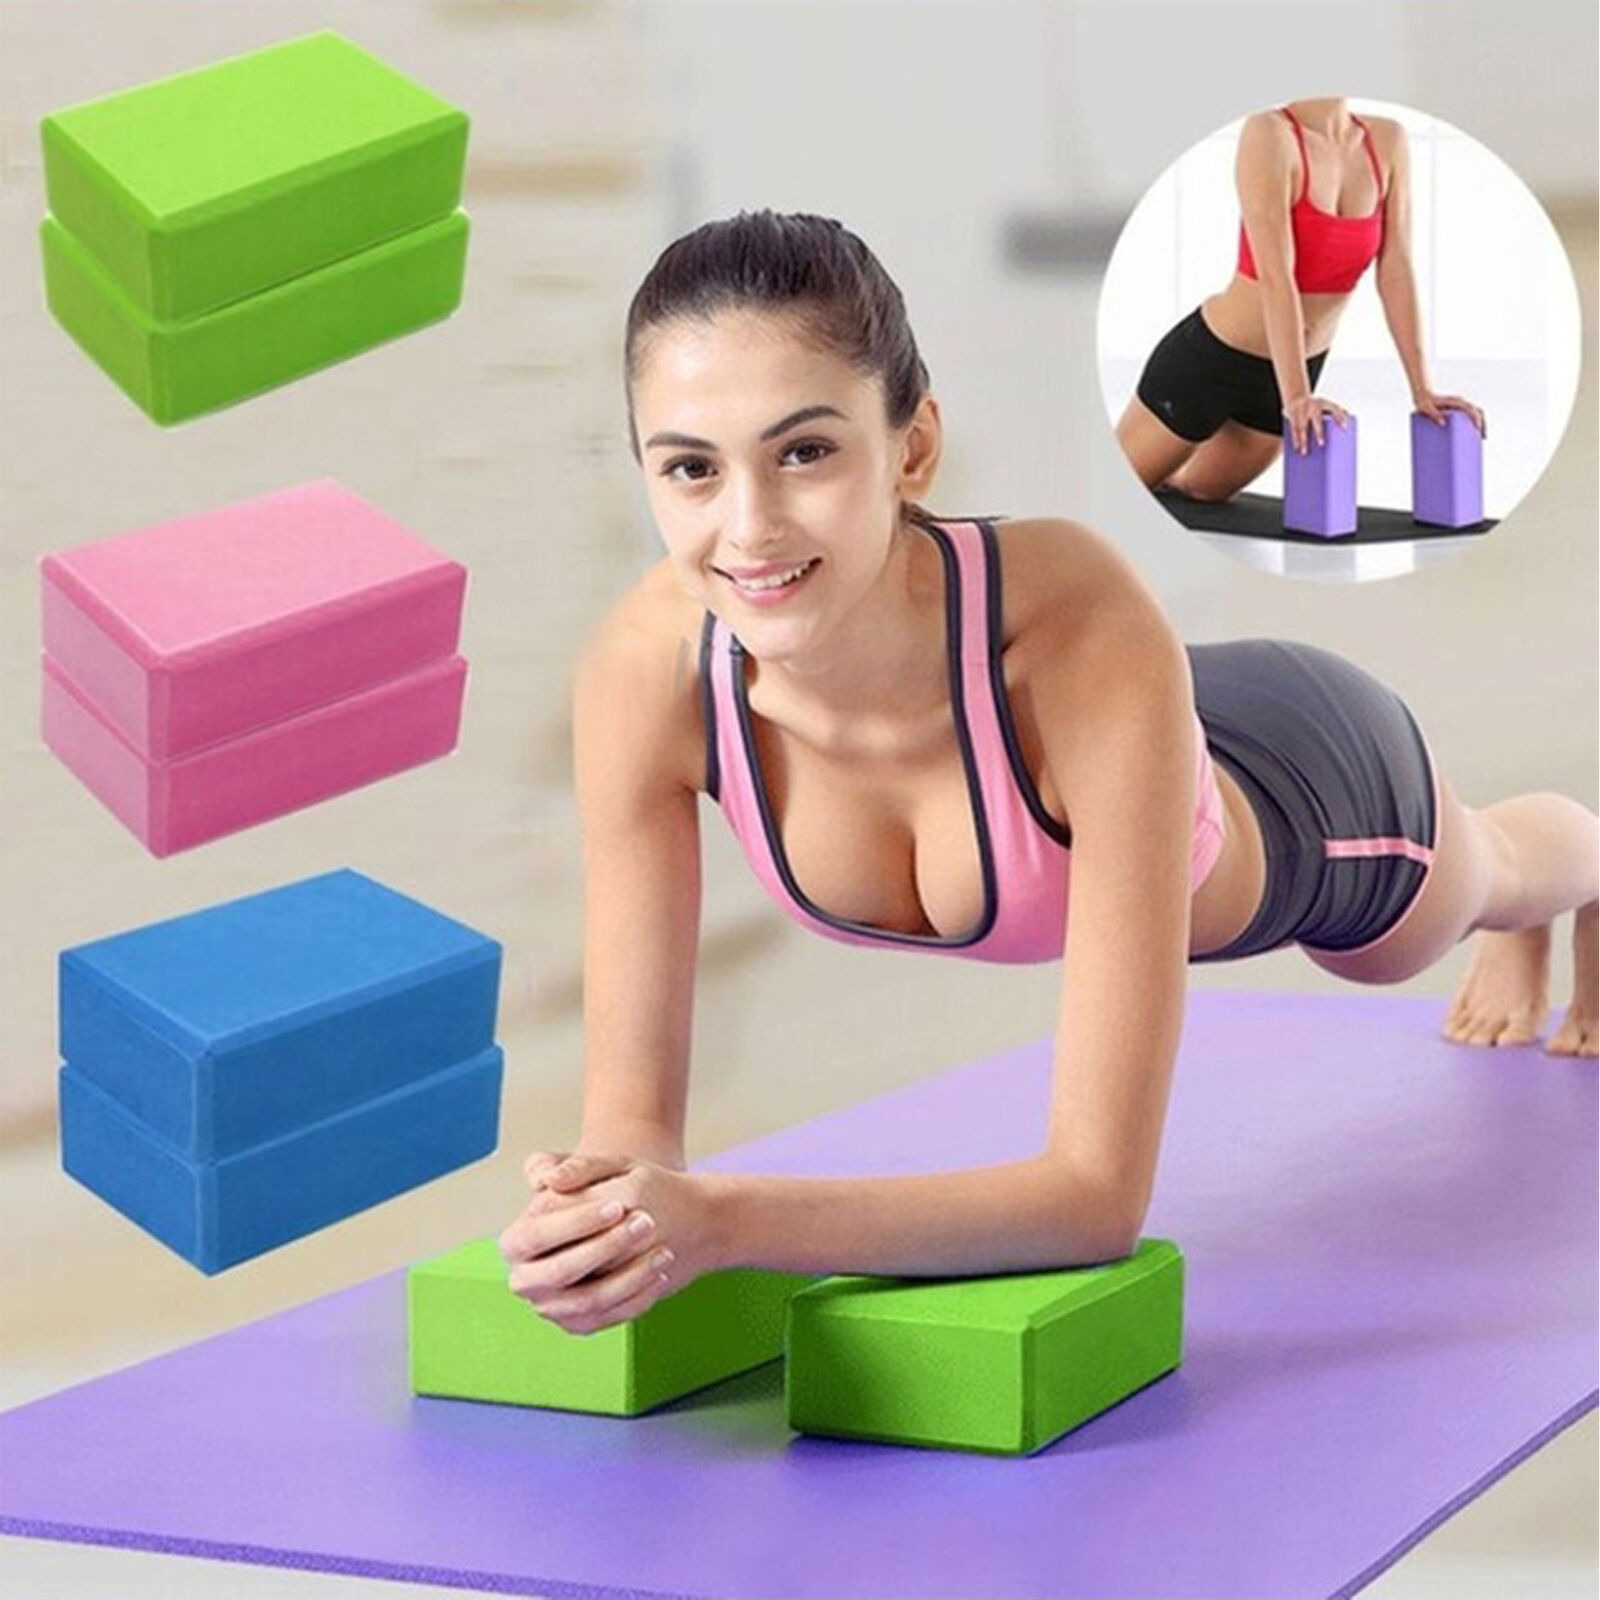 Home Body Building Fitness Pilates Yoga Block Foaming Foam Brick Exercise Fitness Stretching Aid Gym Yoga Blocks